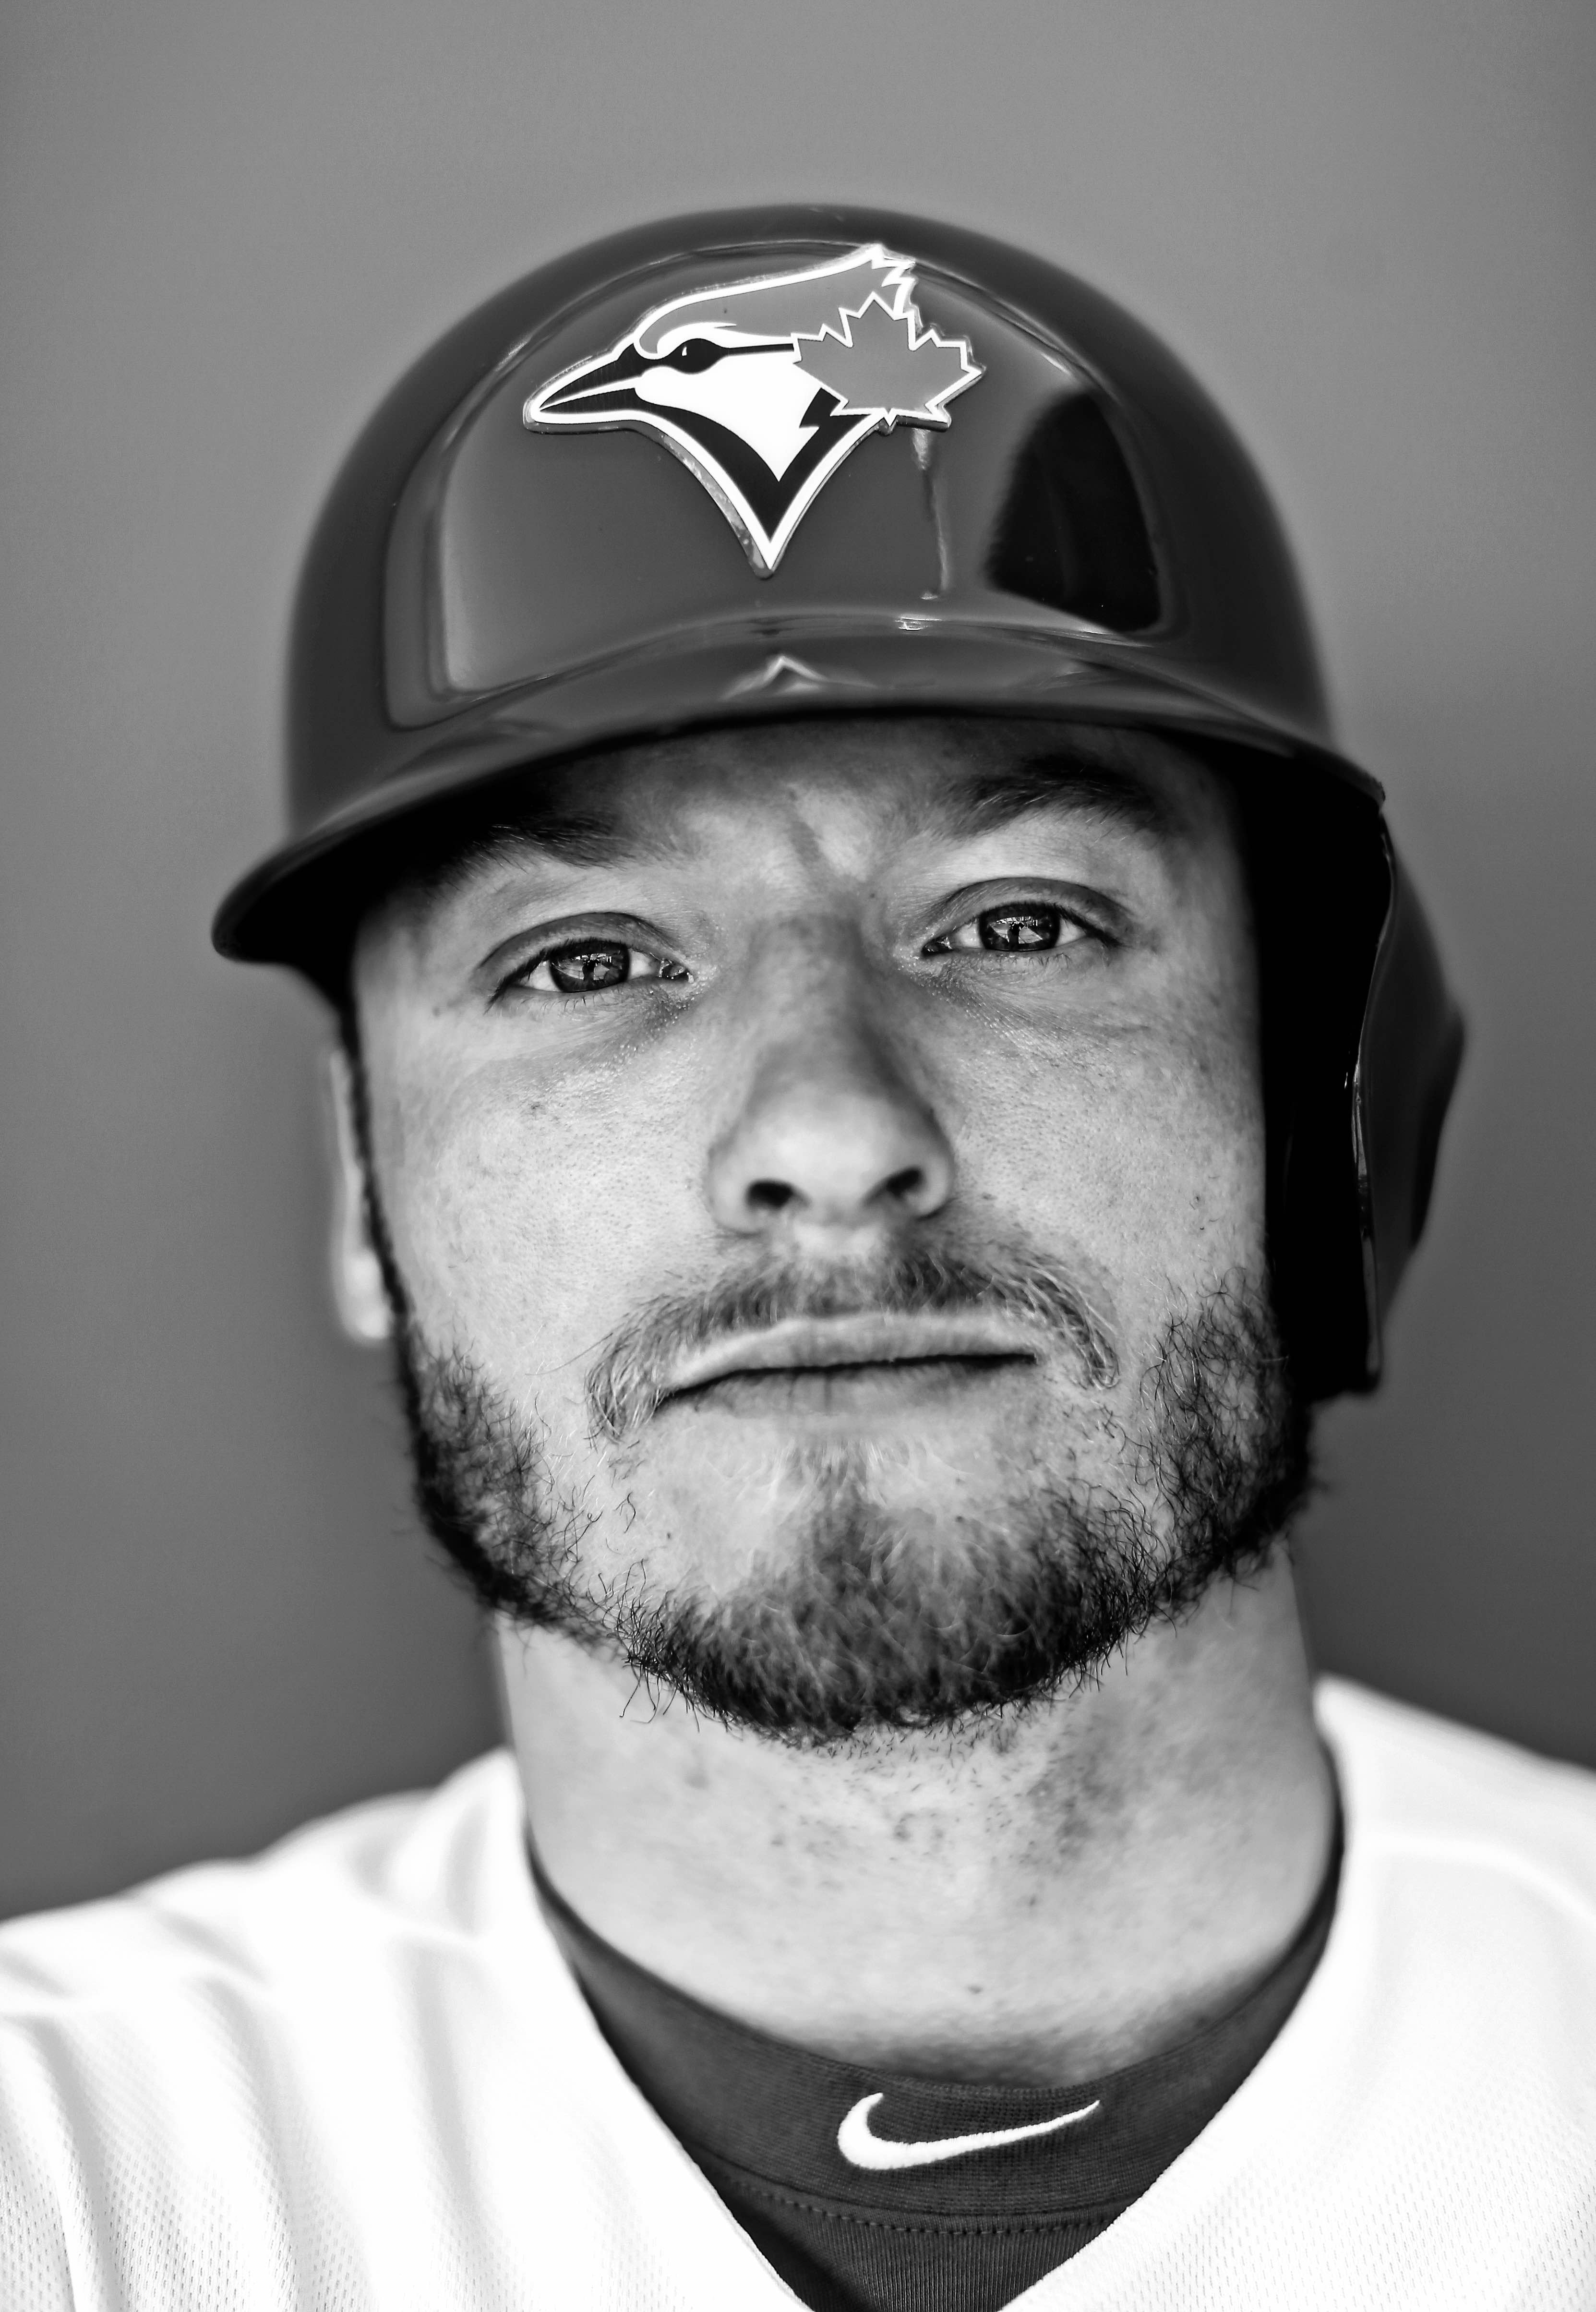 Toronto BlueJays Josh Donaldson (Photo byTom DiPace)